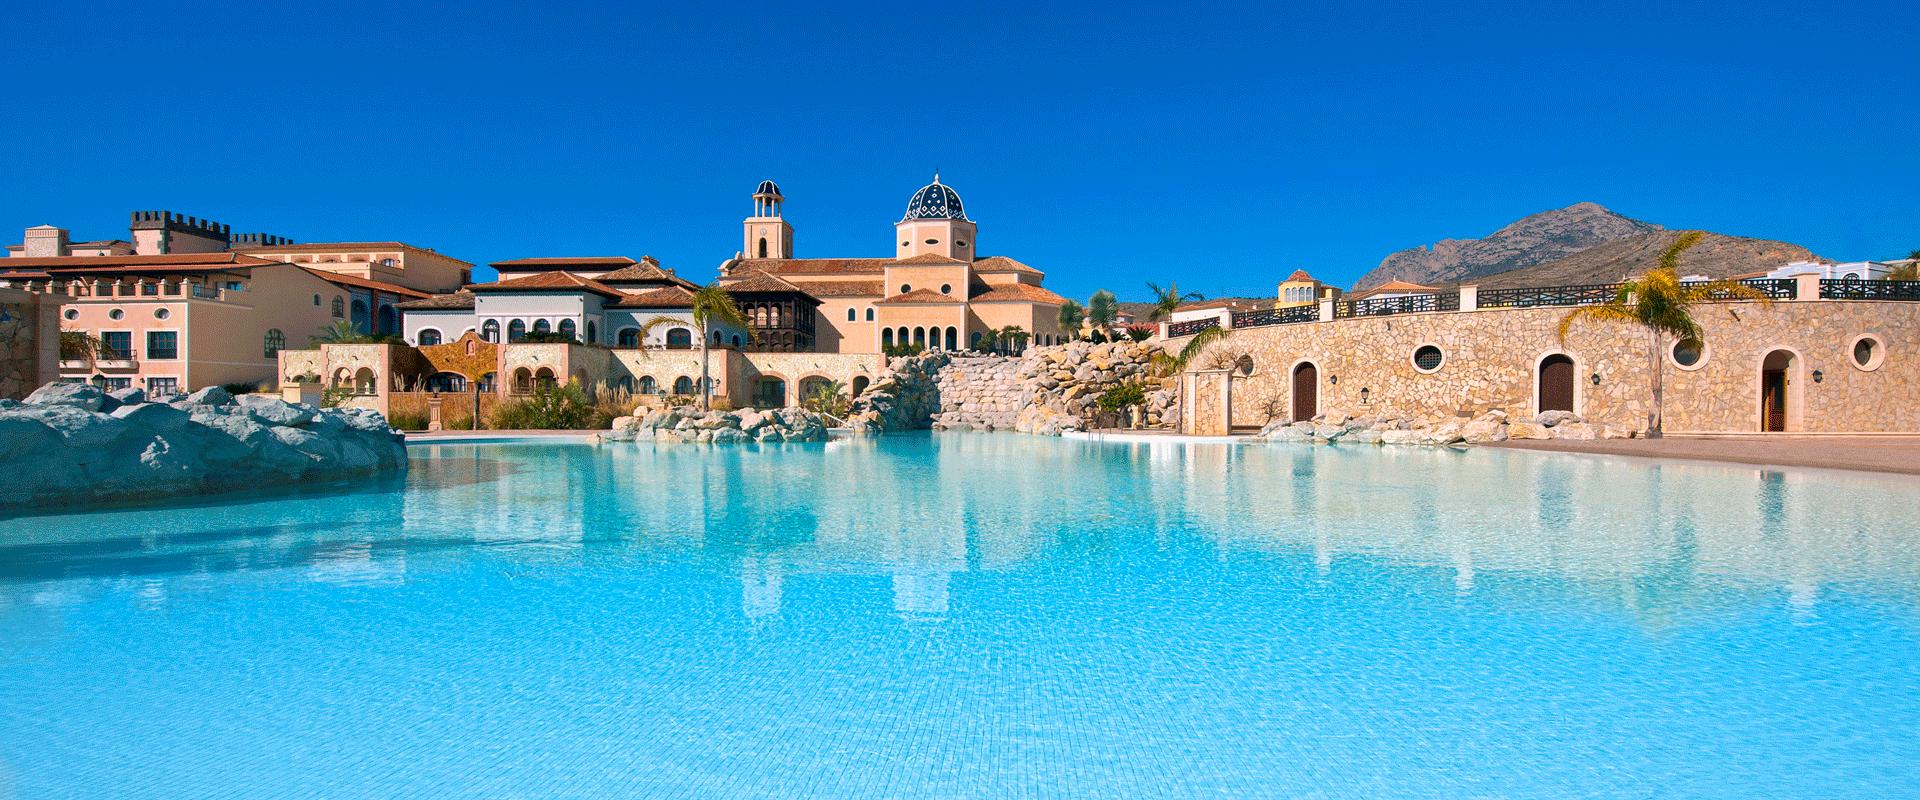 Din Golfreise Hotel Melia Villaitana i Benidorm, Spania - utebasseng